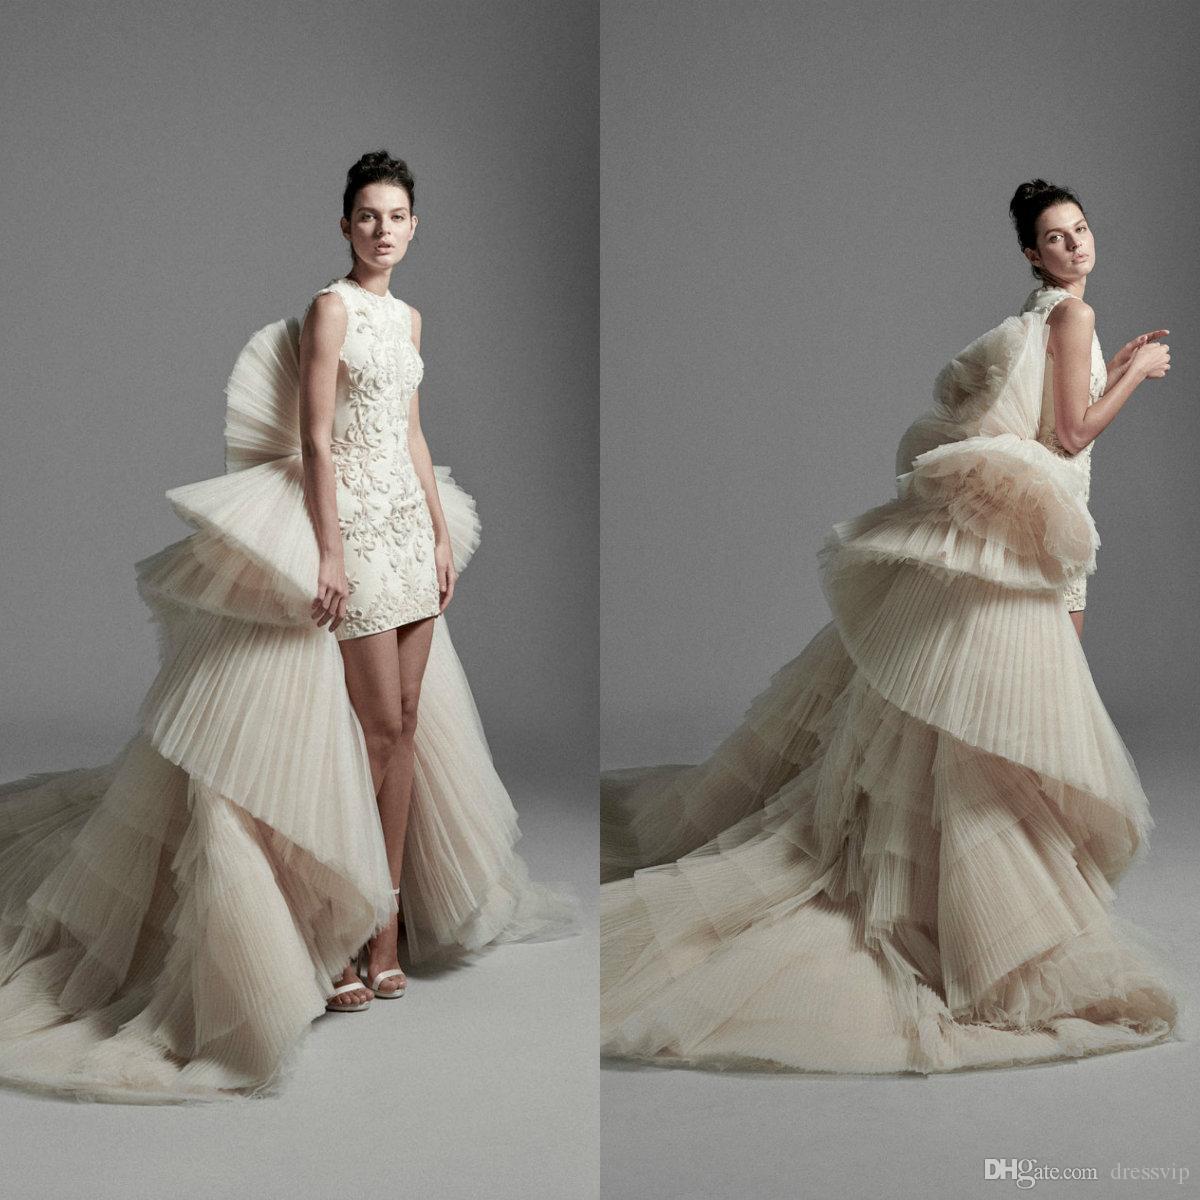 2020 Krikor Jabotian Wedding Dresses With Detachable Train Tulle Ruffles Tiered Skirts High Low Wedding Dress Custom Made Abiti Da Sposa